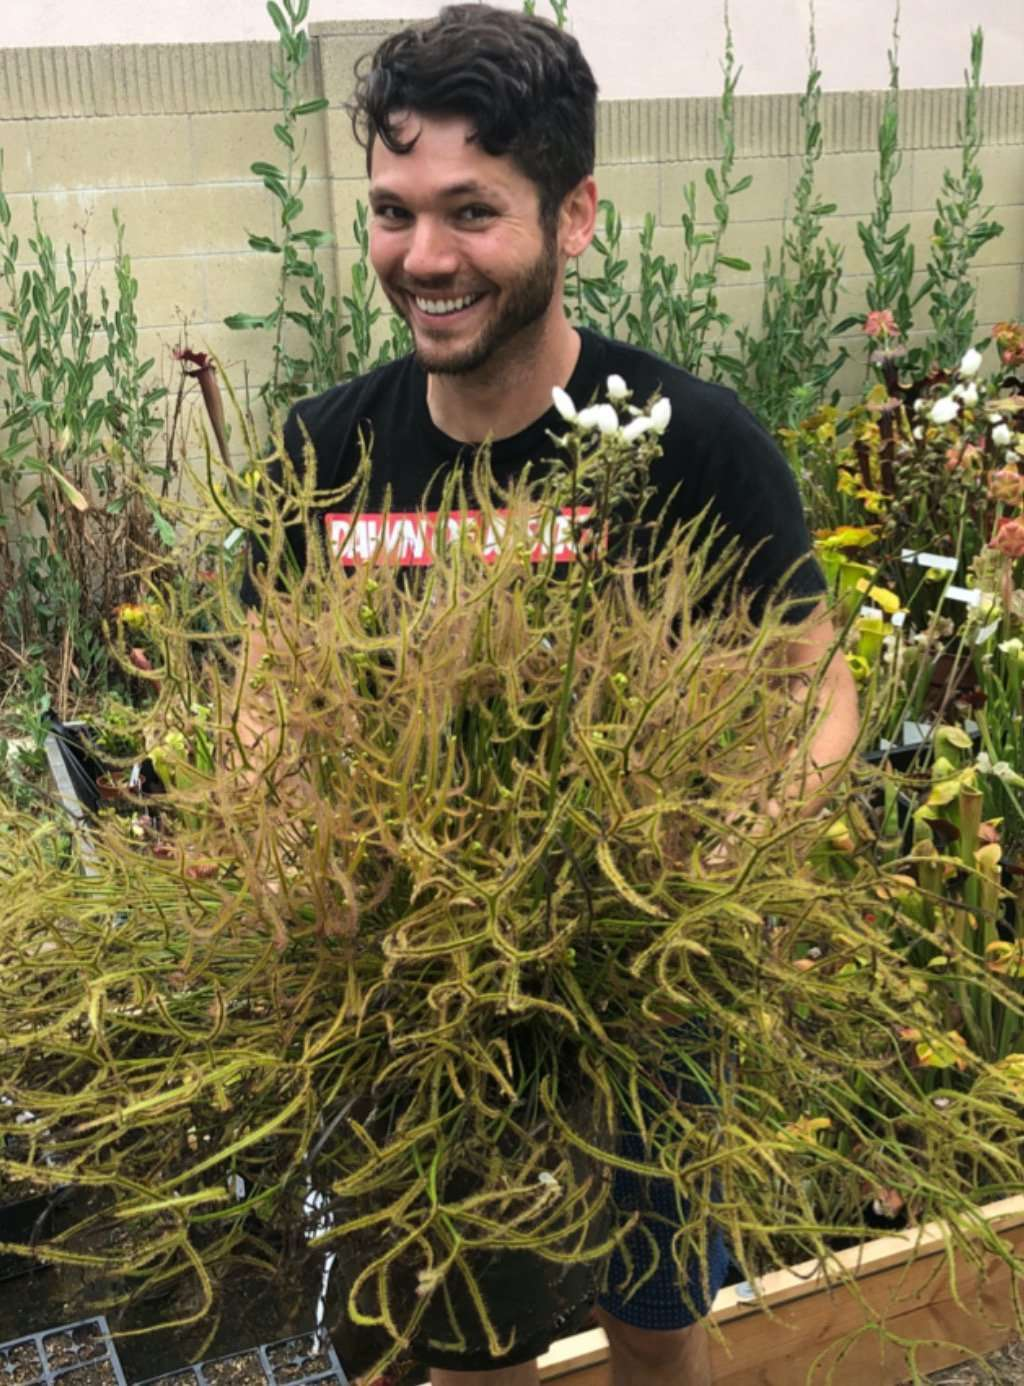 David with a drosera binata dichotomoa giant